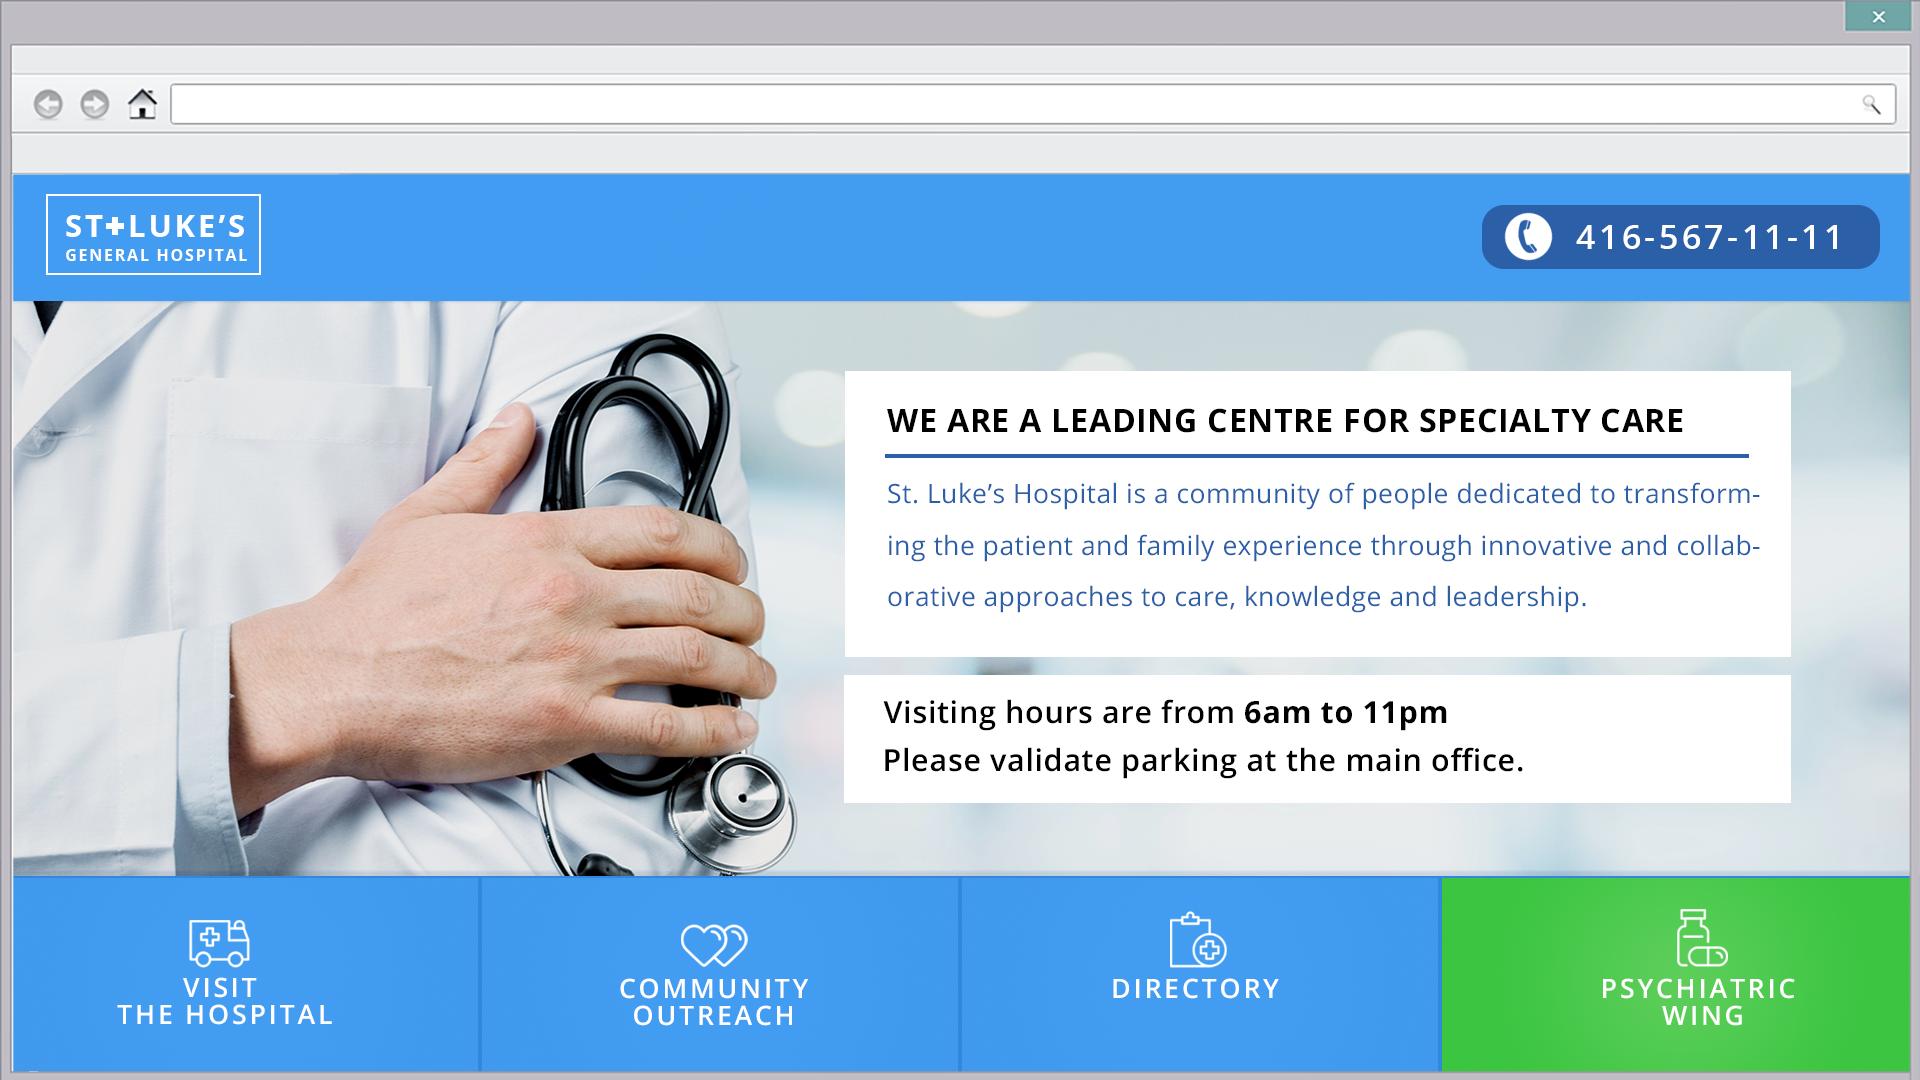 new_hospital_design_patient_visit.png